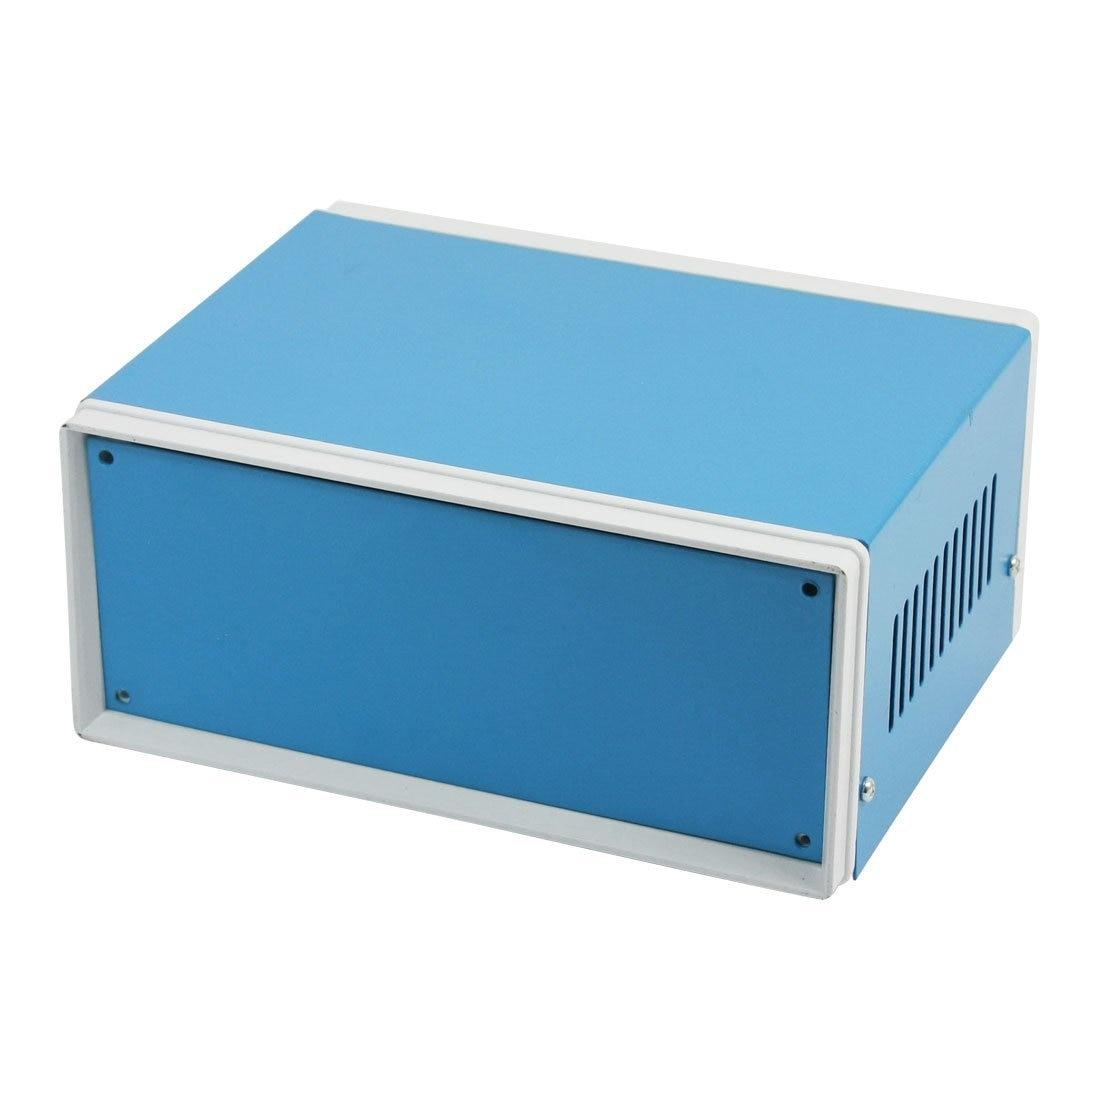 цена на 6.7 x 5.1 x 3.1 Blue Metal Enclosure Project Case DIY Junction Box